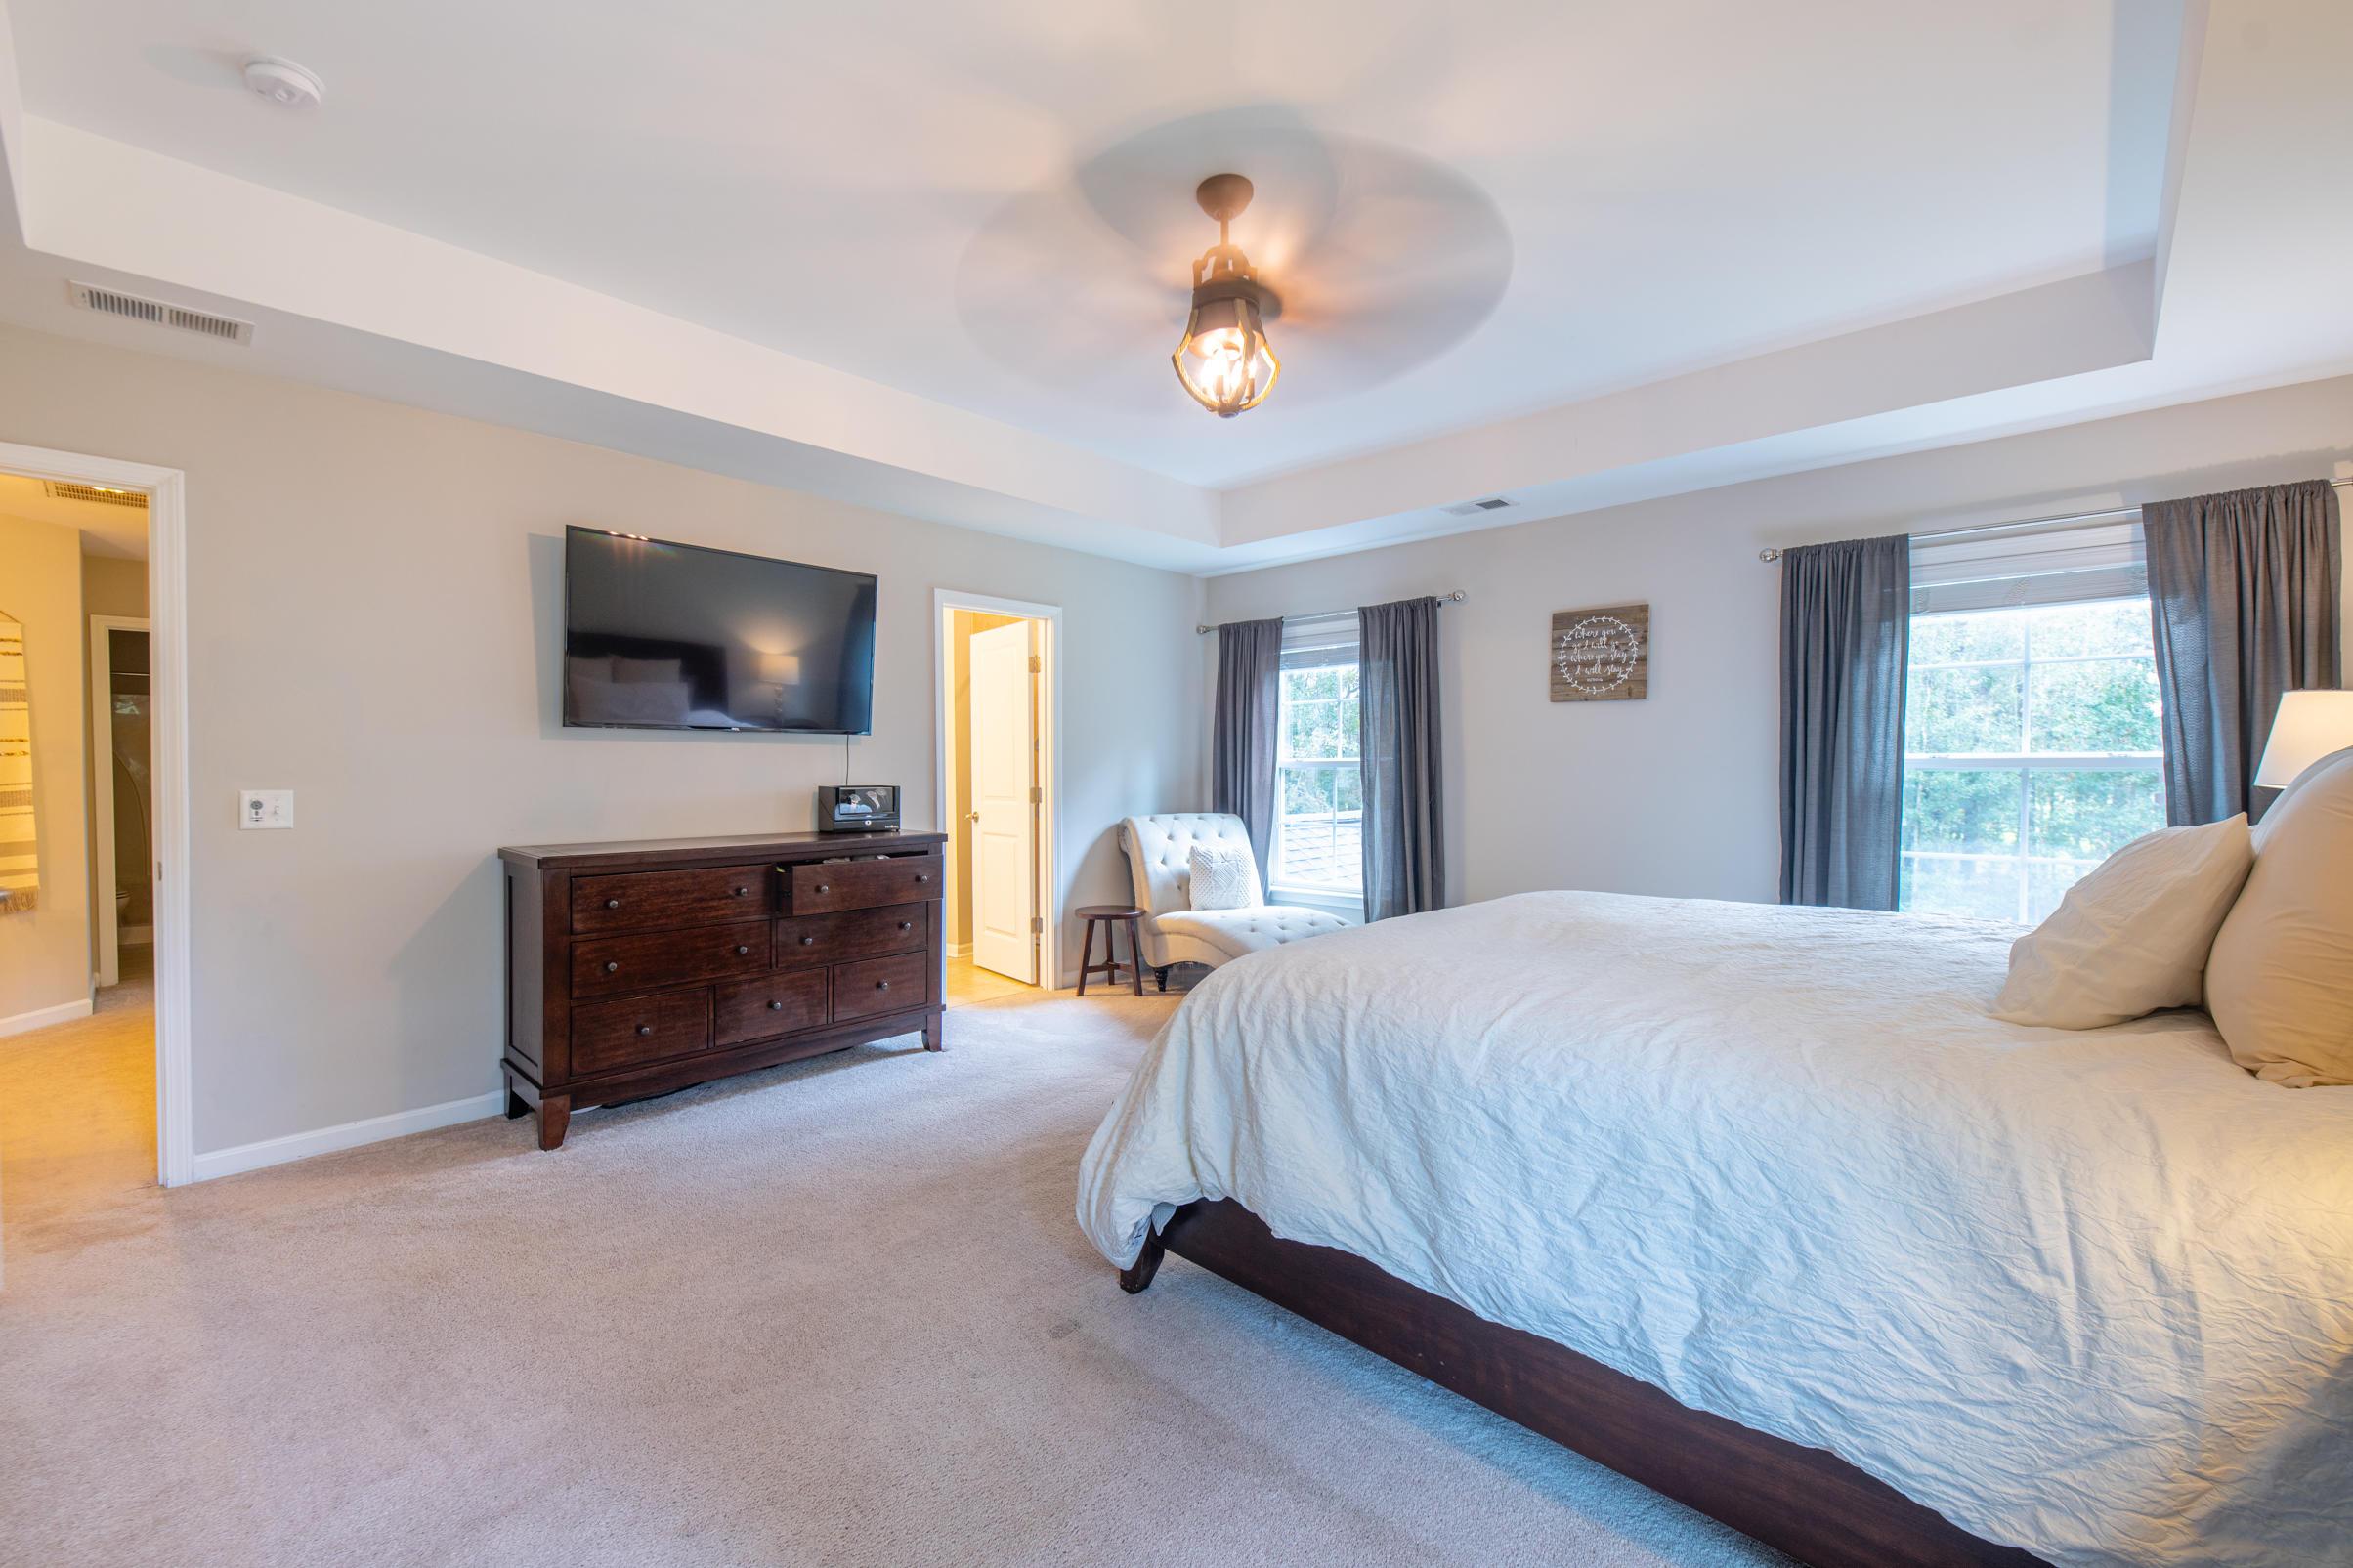 Waterloo Estates Homes For Sale - 2226 Arthur Rose, Johns Island, SC - 80